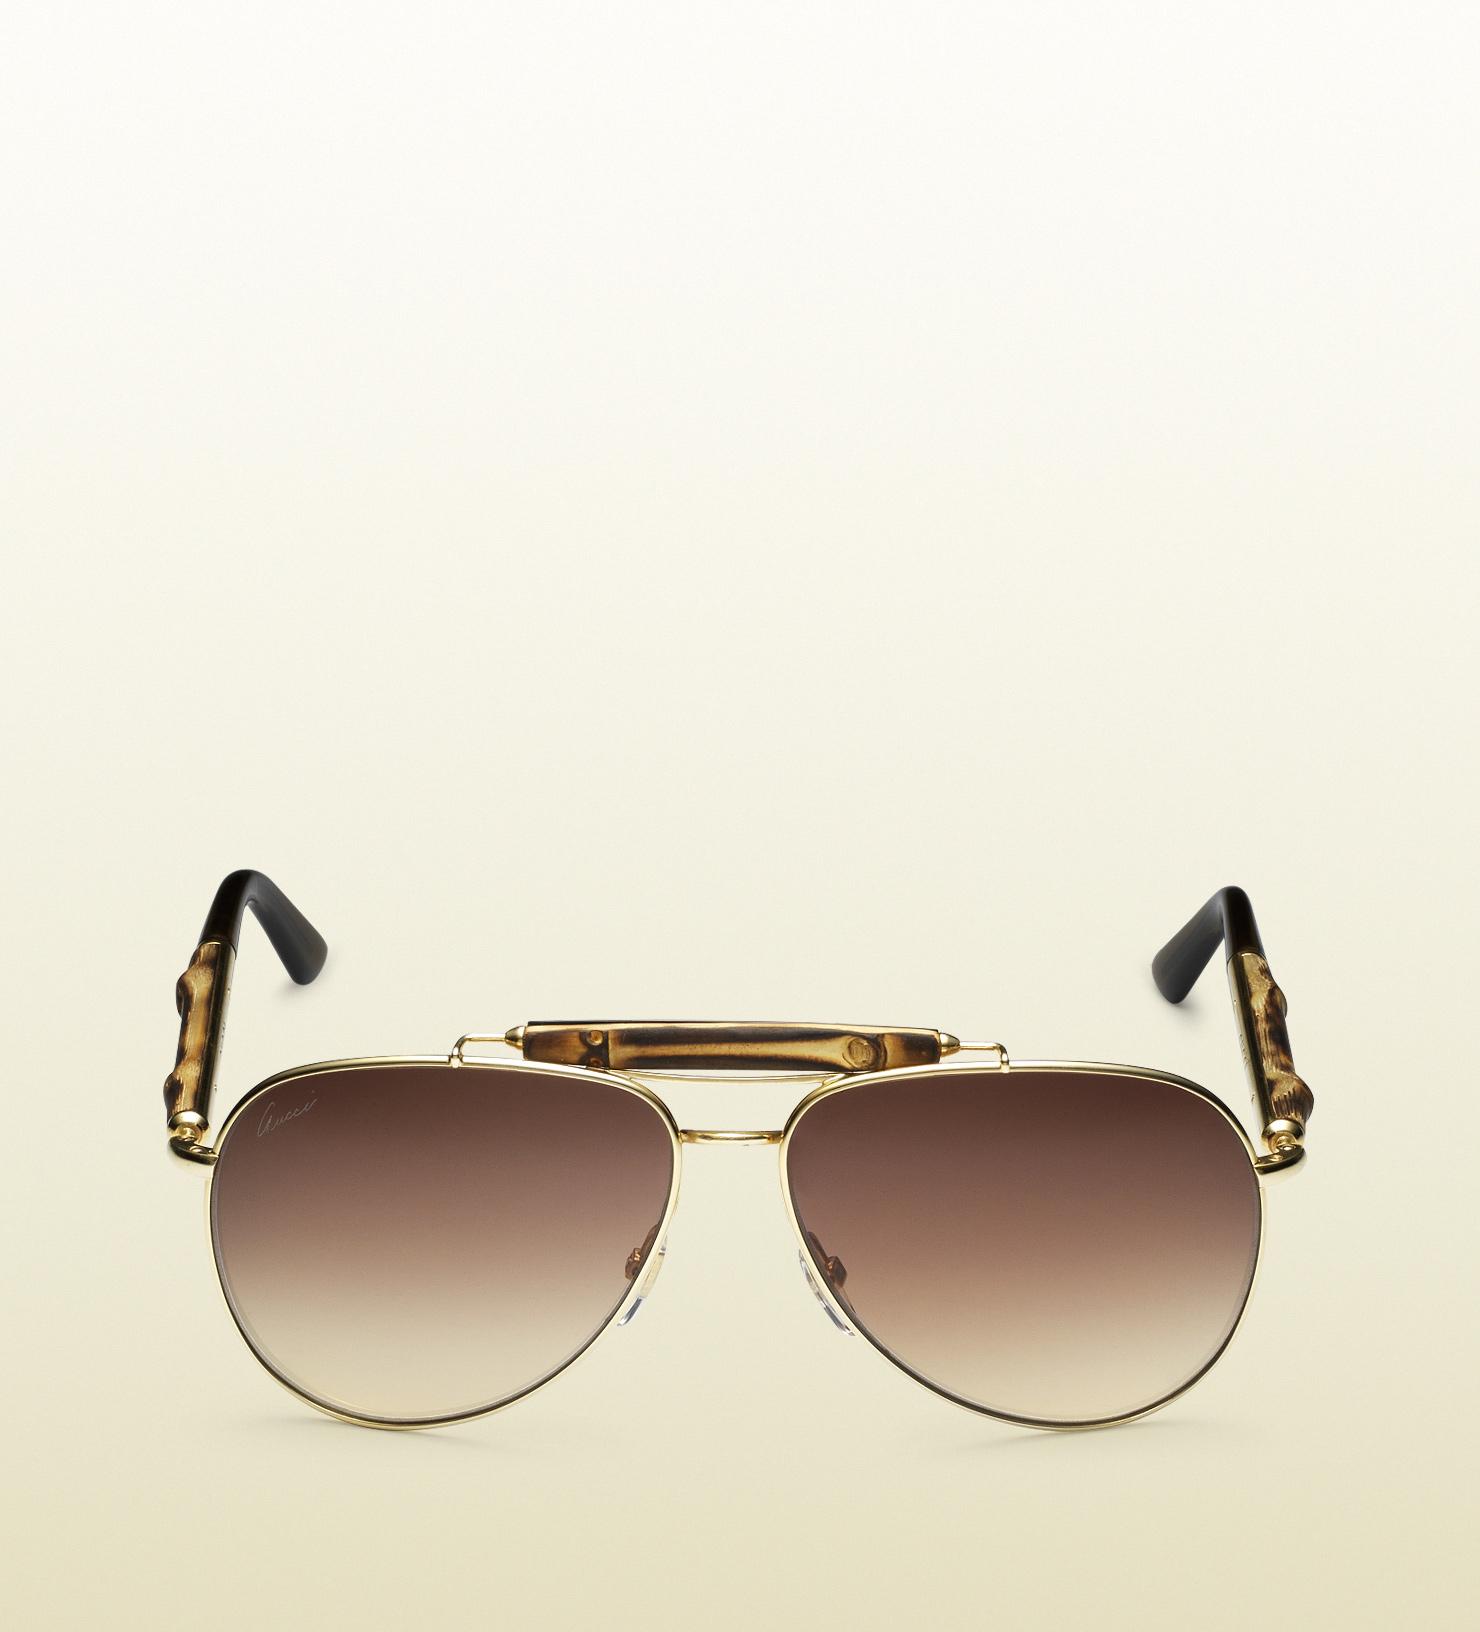 Black And Gold Gucci Glasses